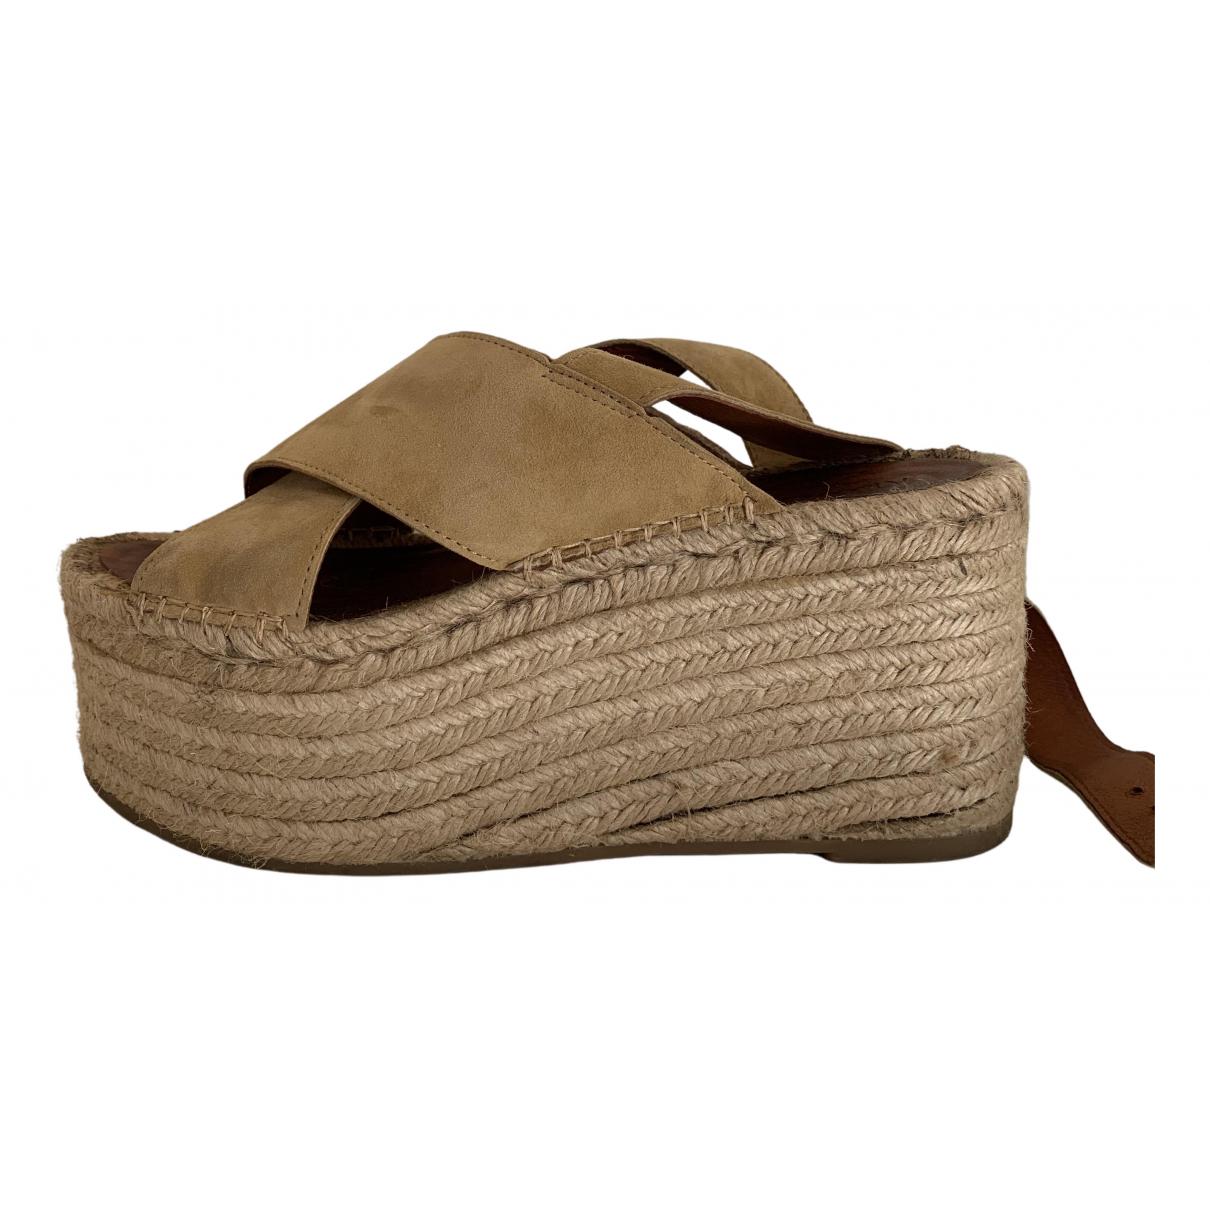 Alohas N Beige Suede Sandals for Women 40 EU